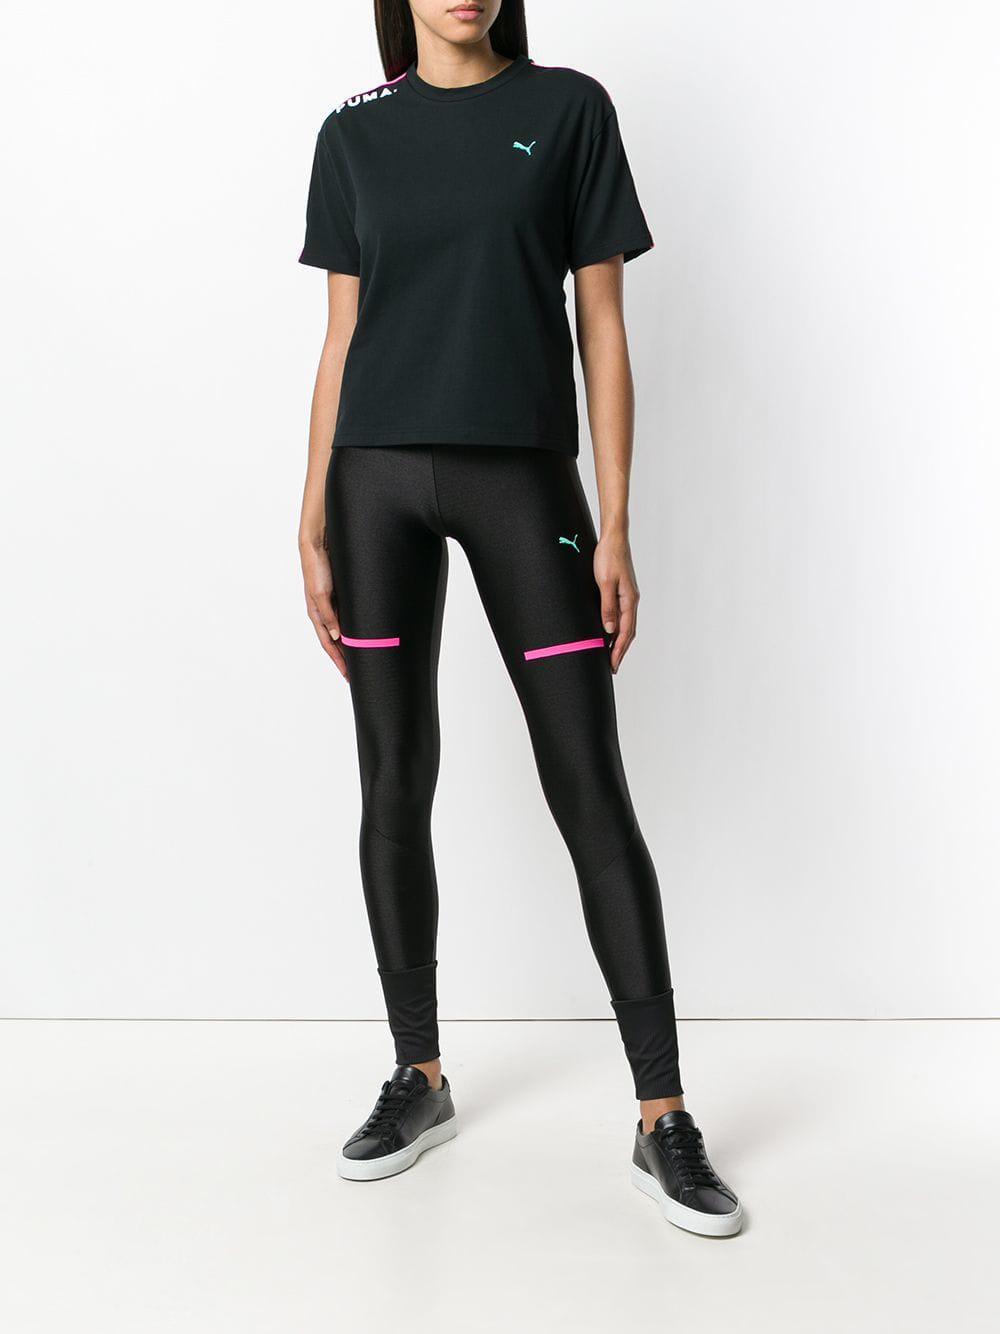 088ebfd4378ba PUMA Chase leggings in Black - Lyst